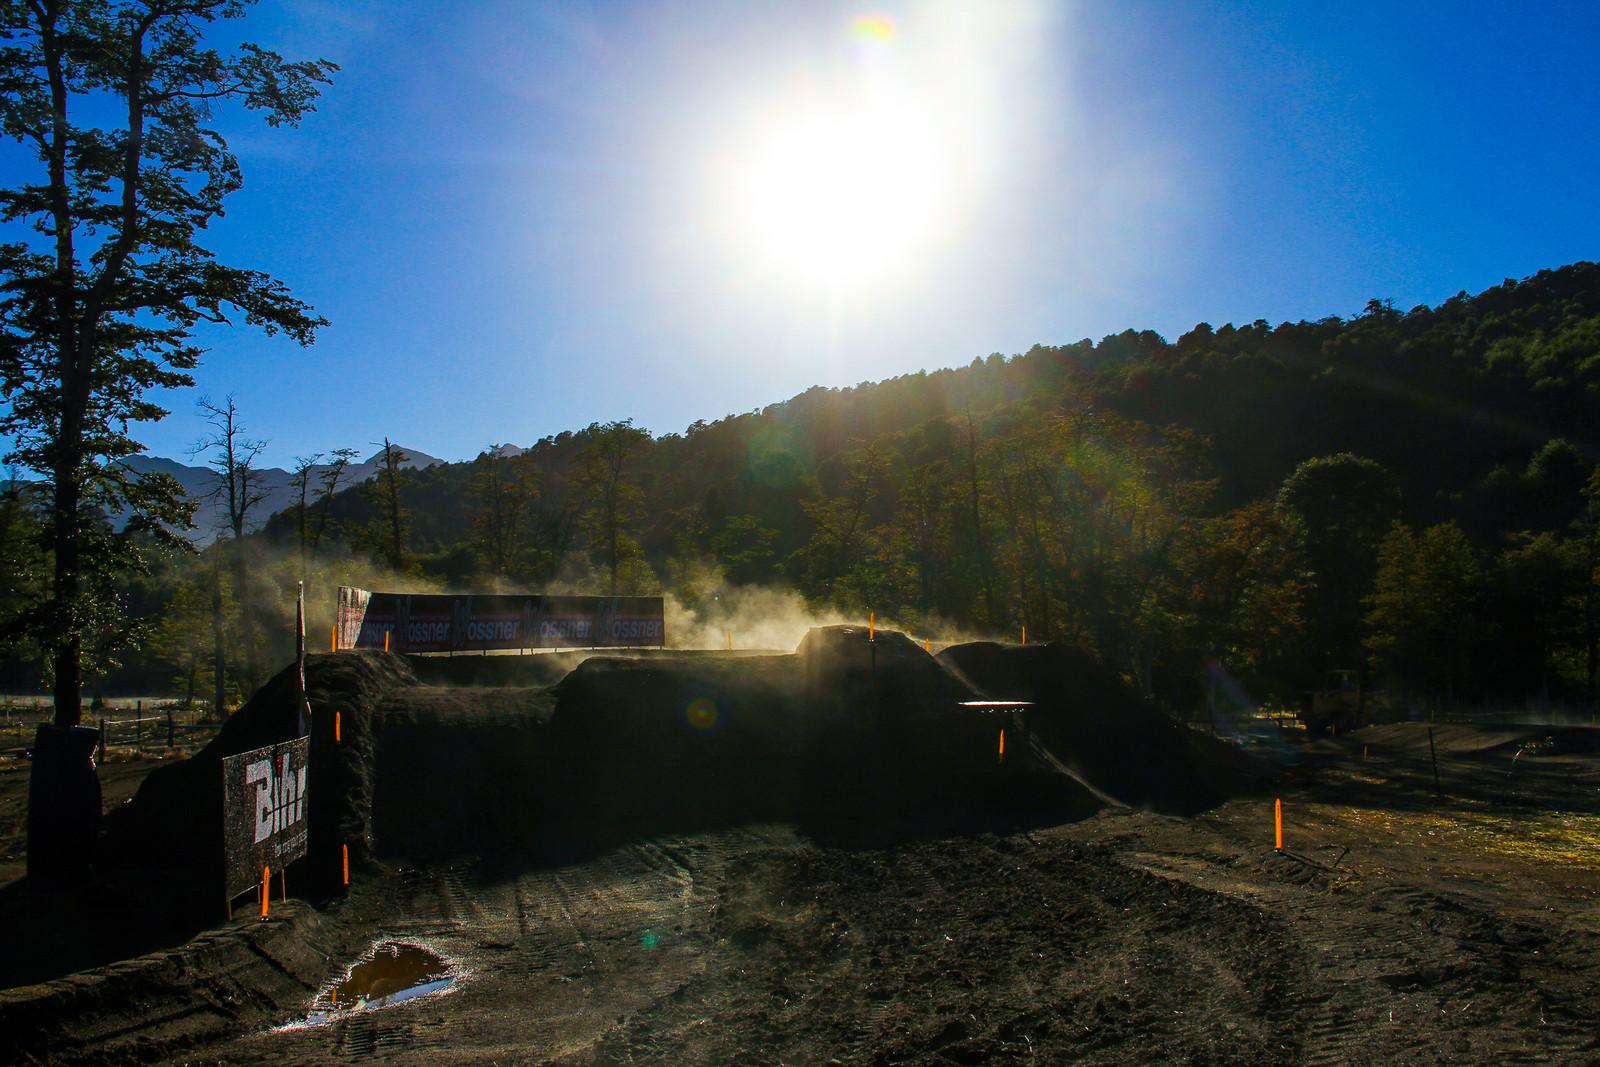 Patagonia Argentina Track - Photo Blast: 2017 MXGP of Argentina - Motocross Pictures - Vital MX